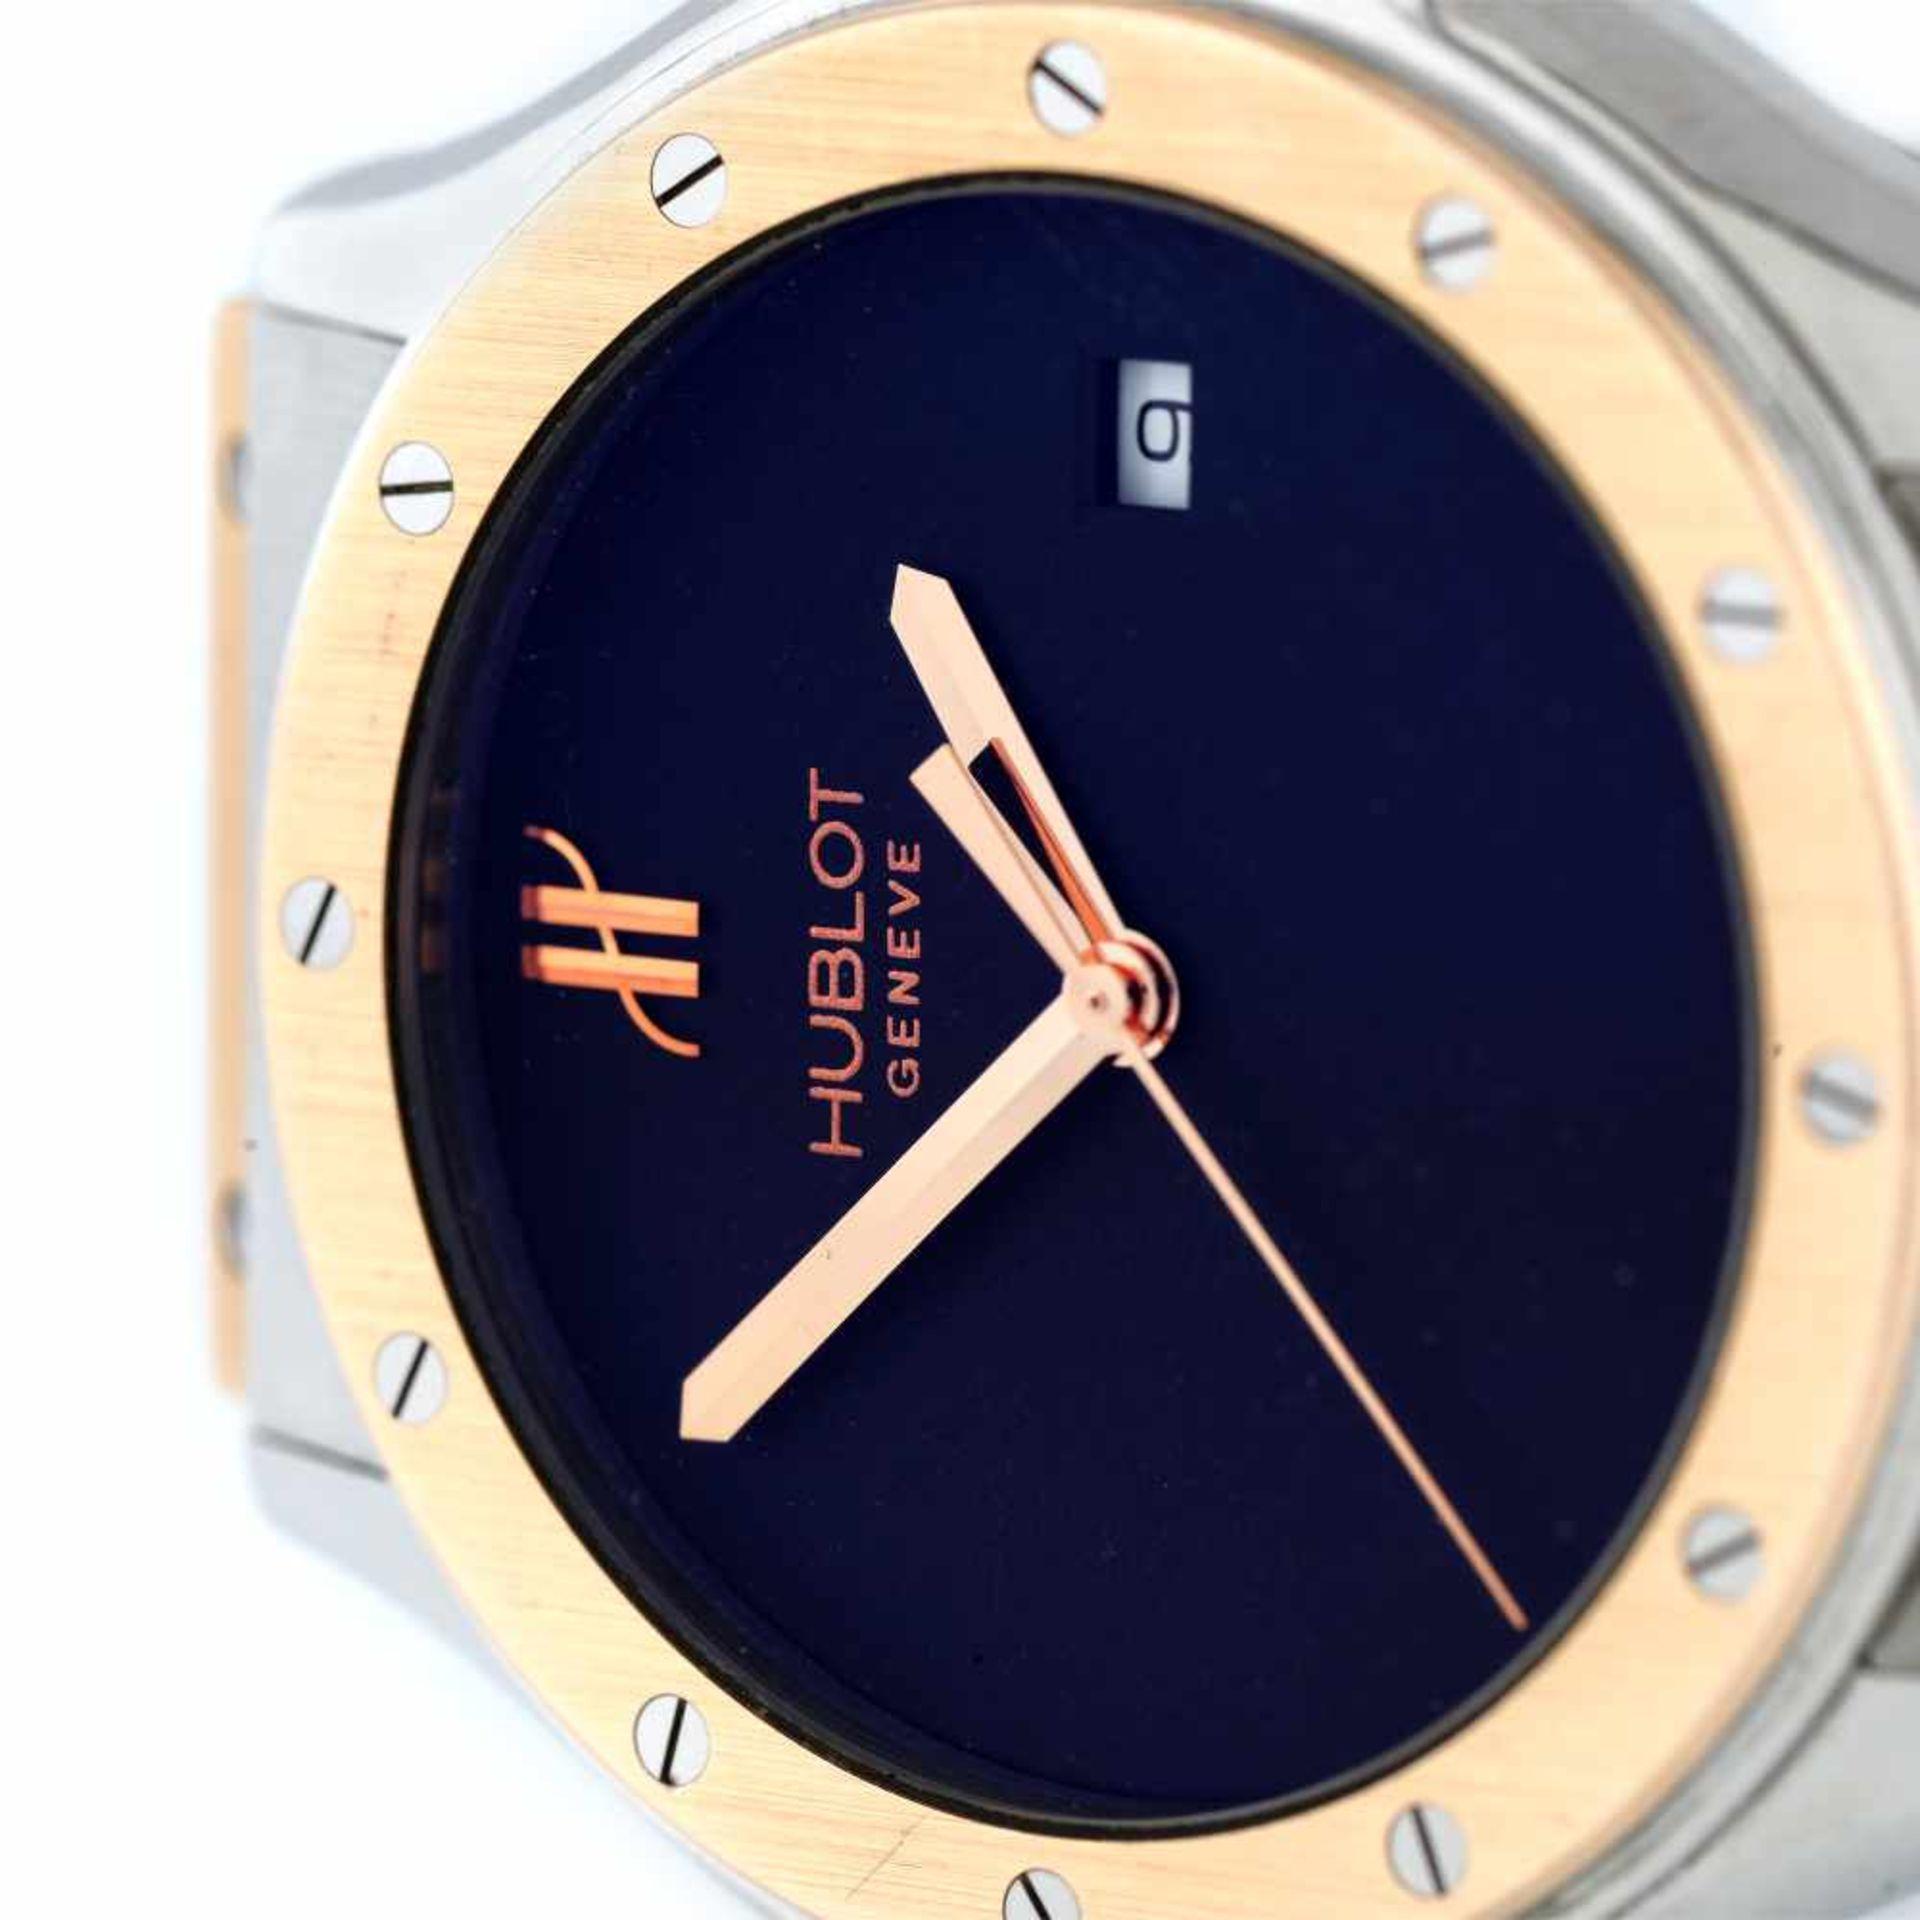 Hublot Classic Fusion wristwatch, steel and rose gold, unisex, provenance documents - Bild 2 aus 3